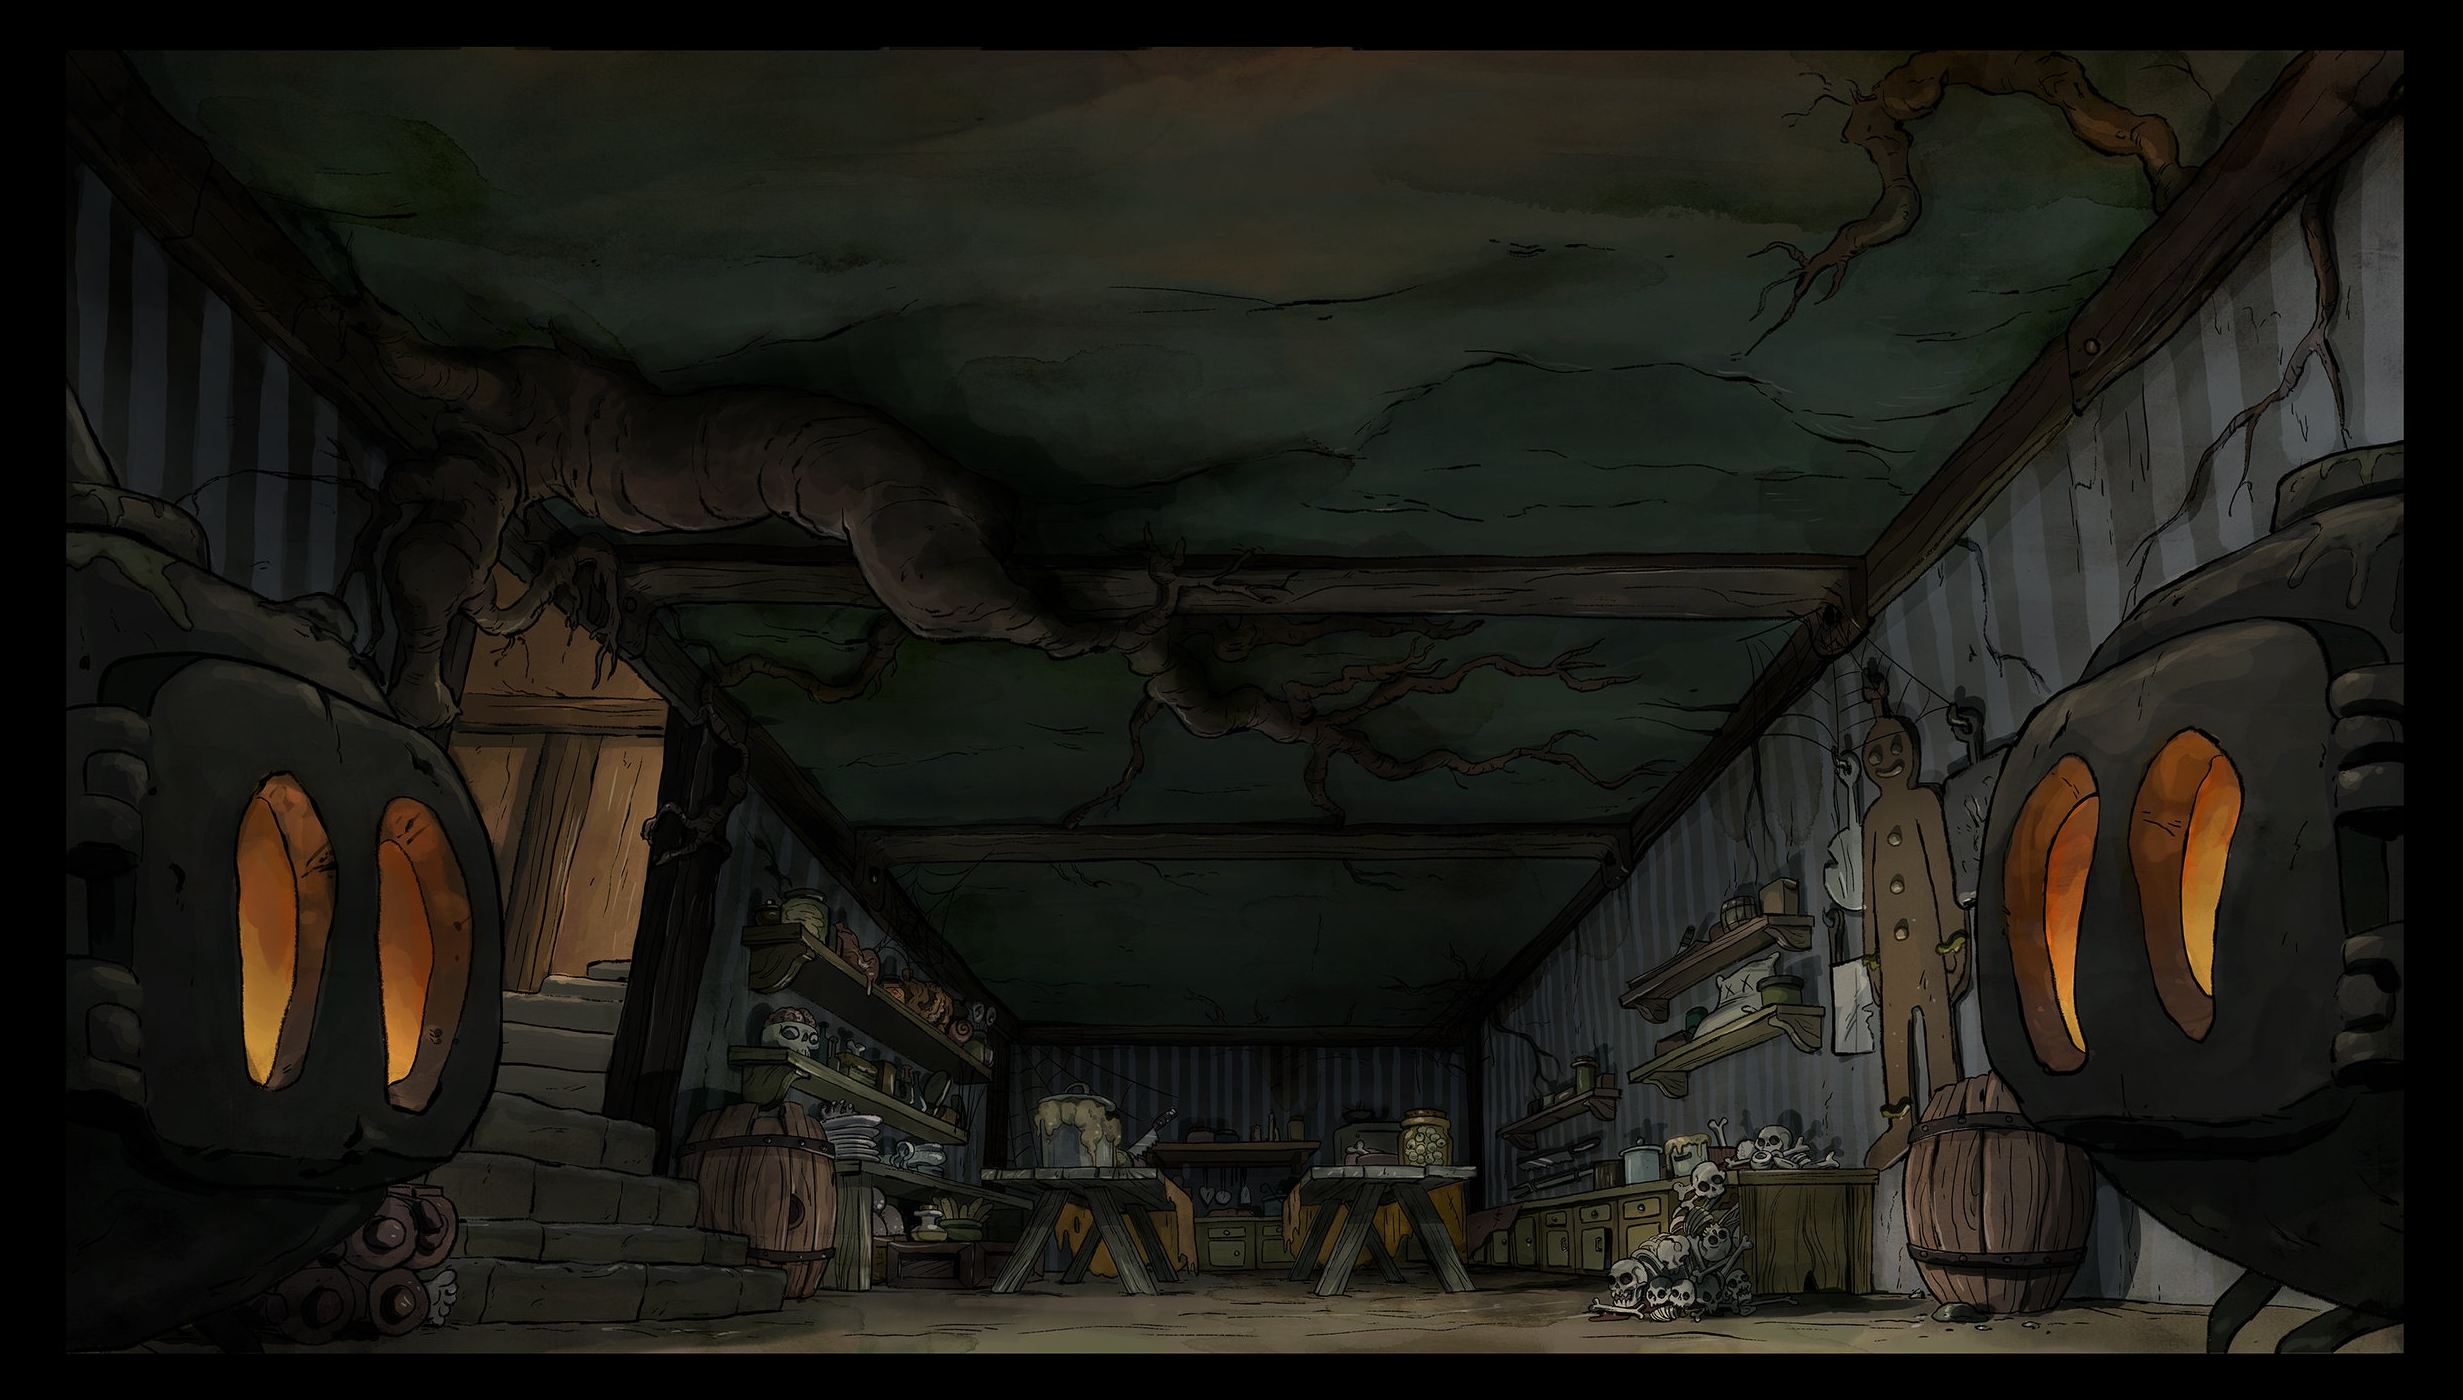 Candy house basement